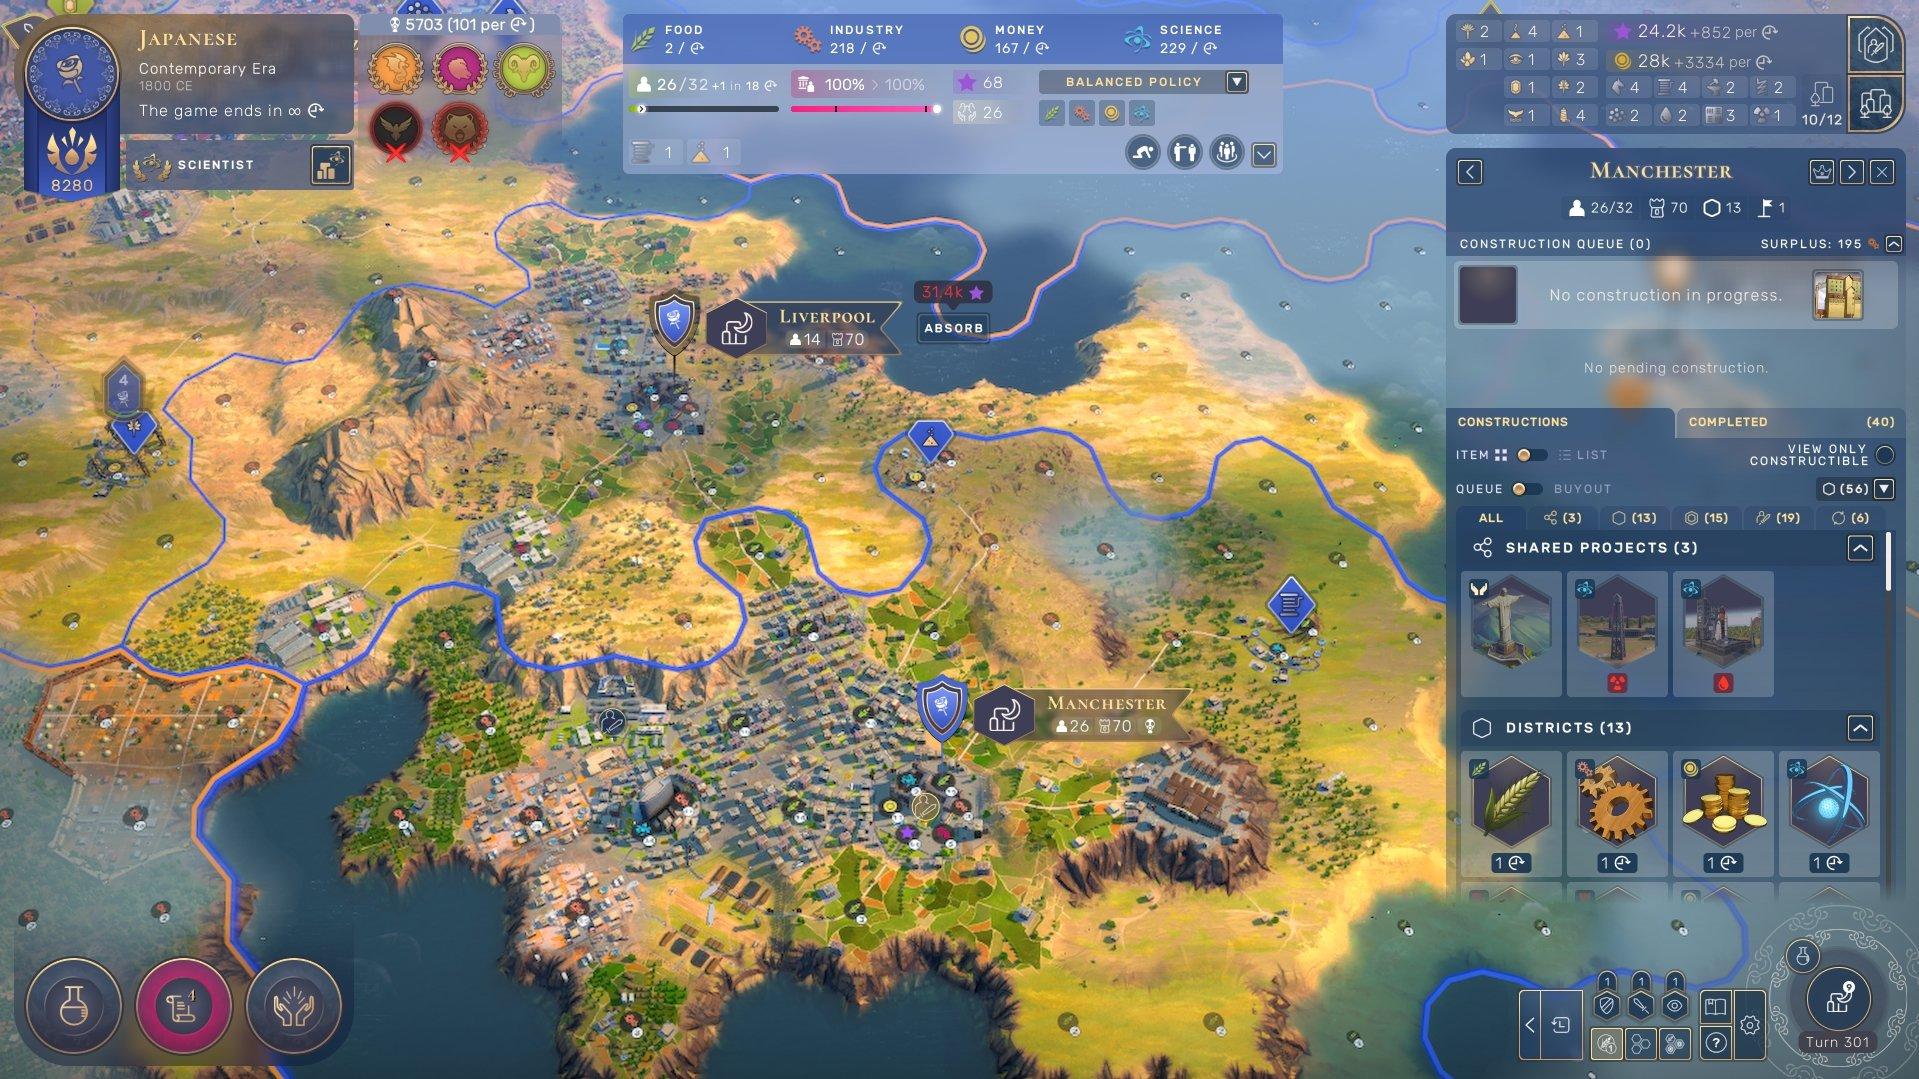 Humankind - Absorb City Screenshot